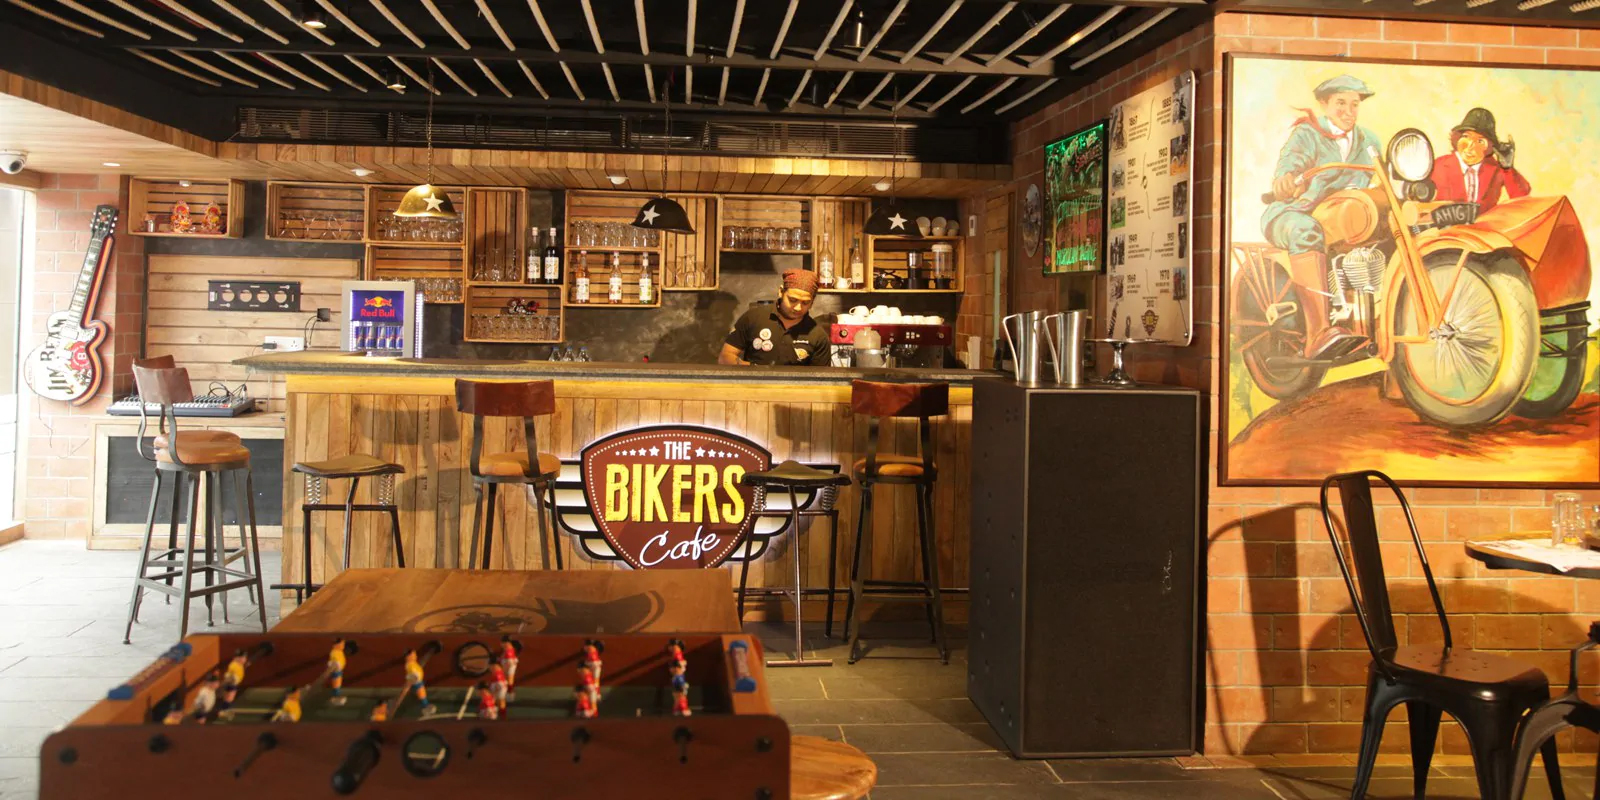 The Biker's Café - Restaurants In Kolkata That Every Tourists Must Visit